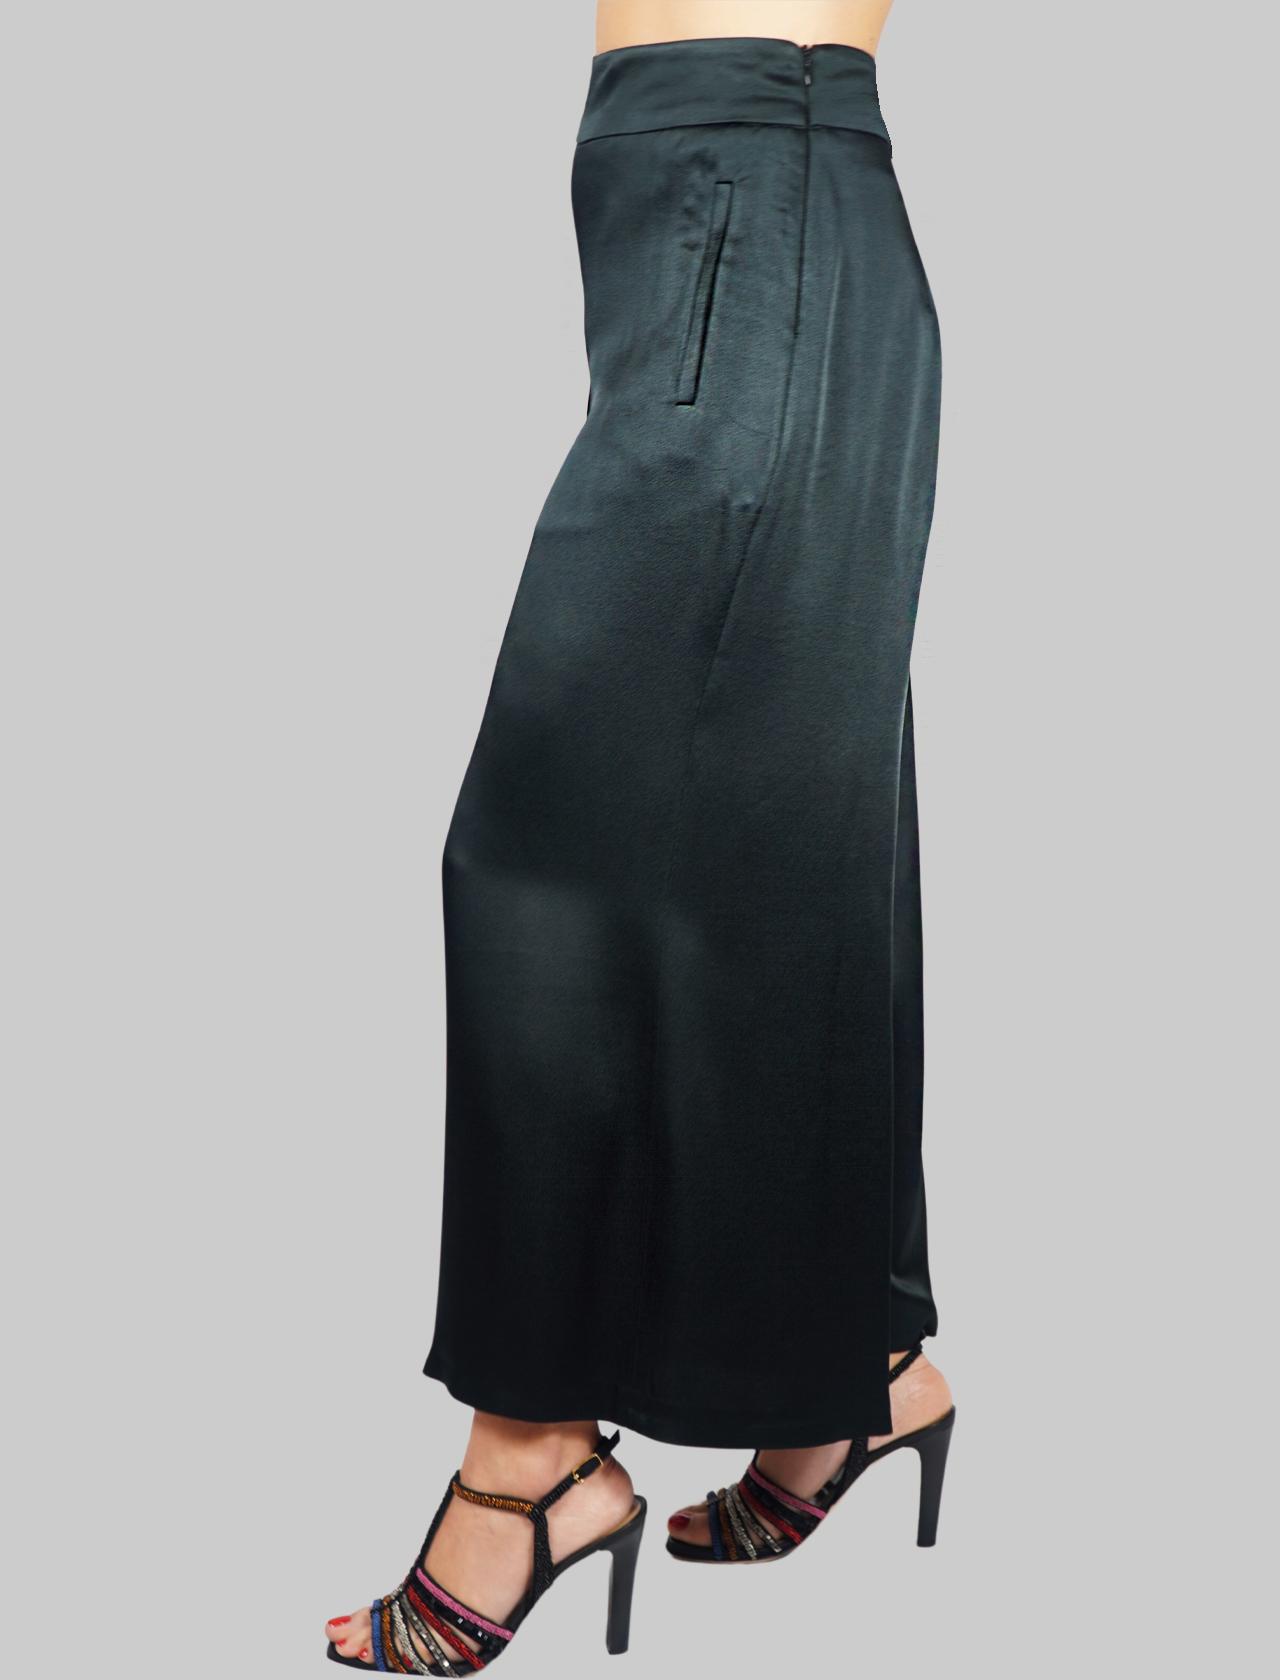 Abbigliamento Donna Pantalone Liquid Cady Nero Gamba Ampia Maliparmi   Gonne e Pantaloni   JH71915012320000